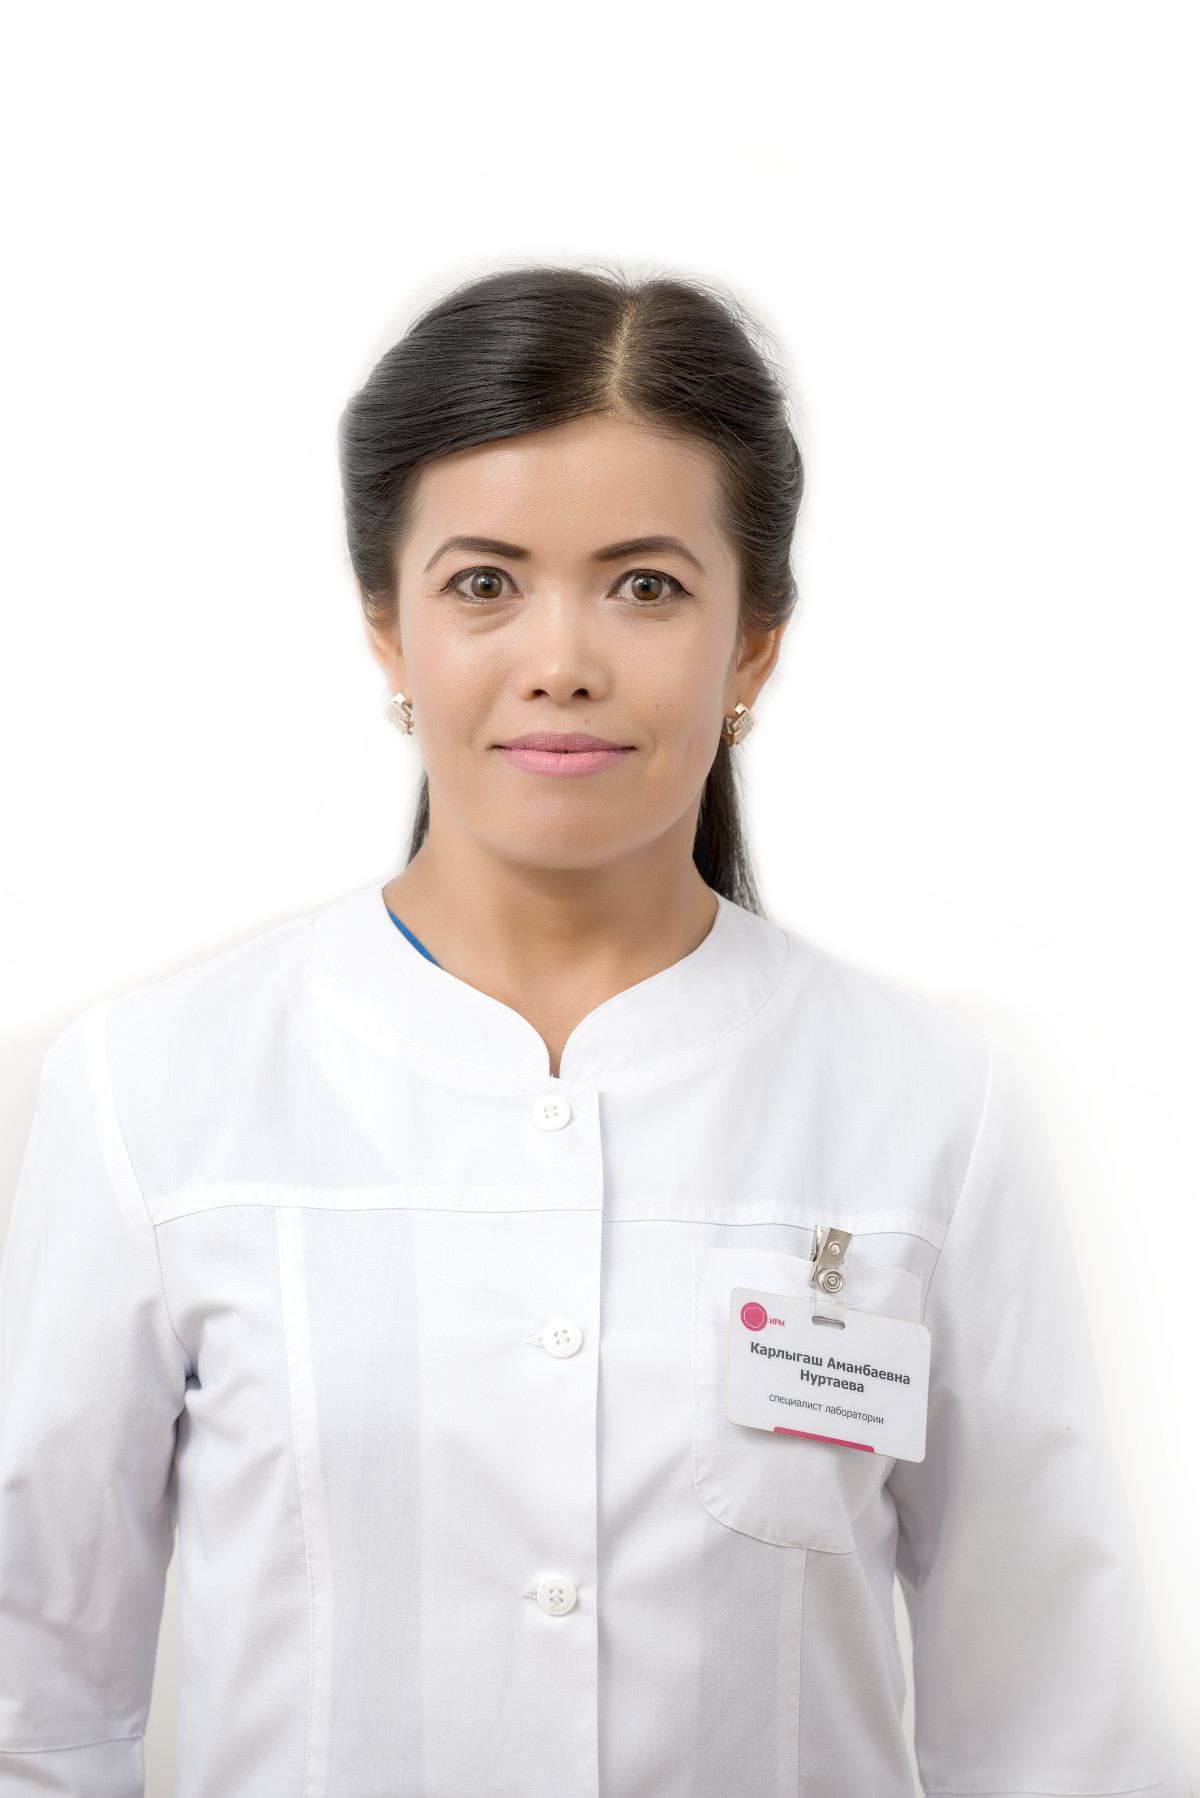 Нуртаева Карлыгаш Аманбаевна фото